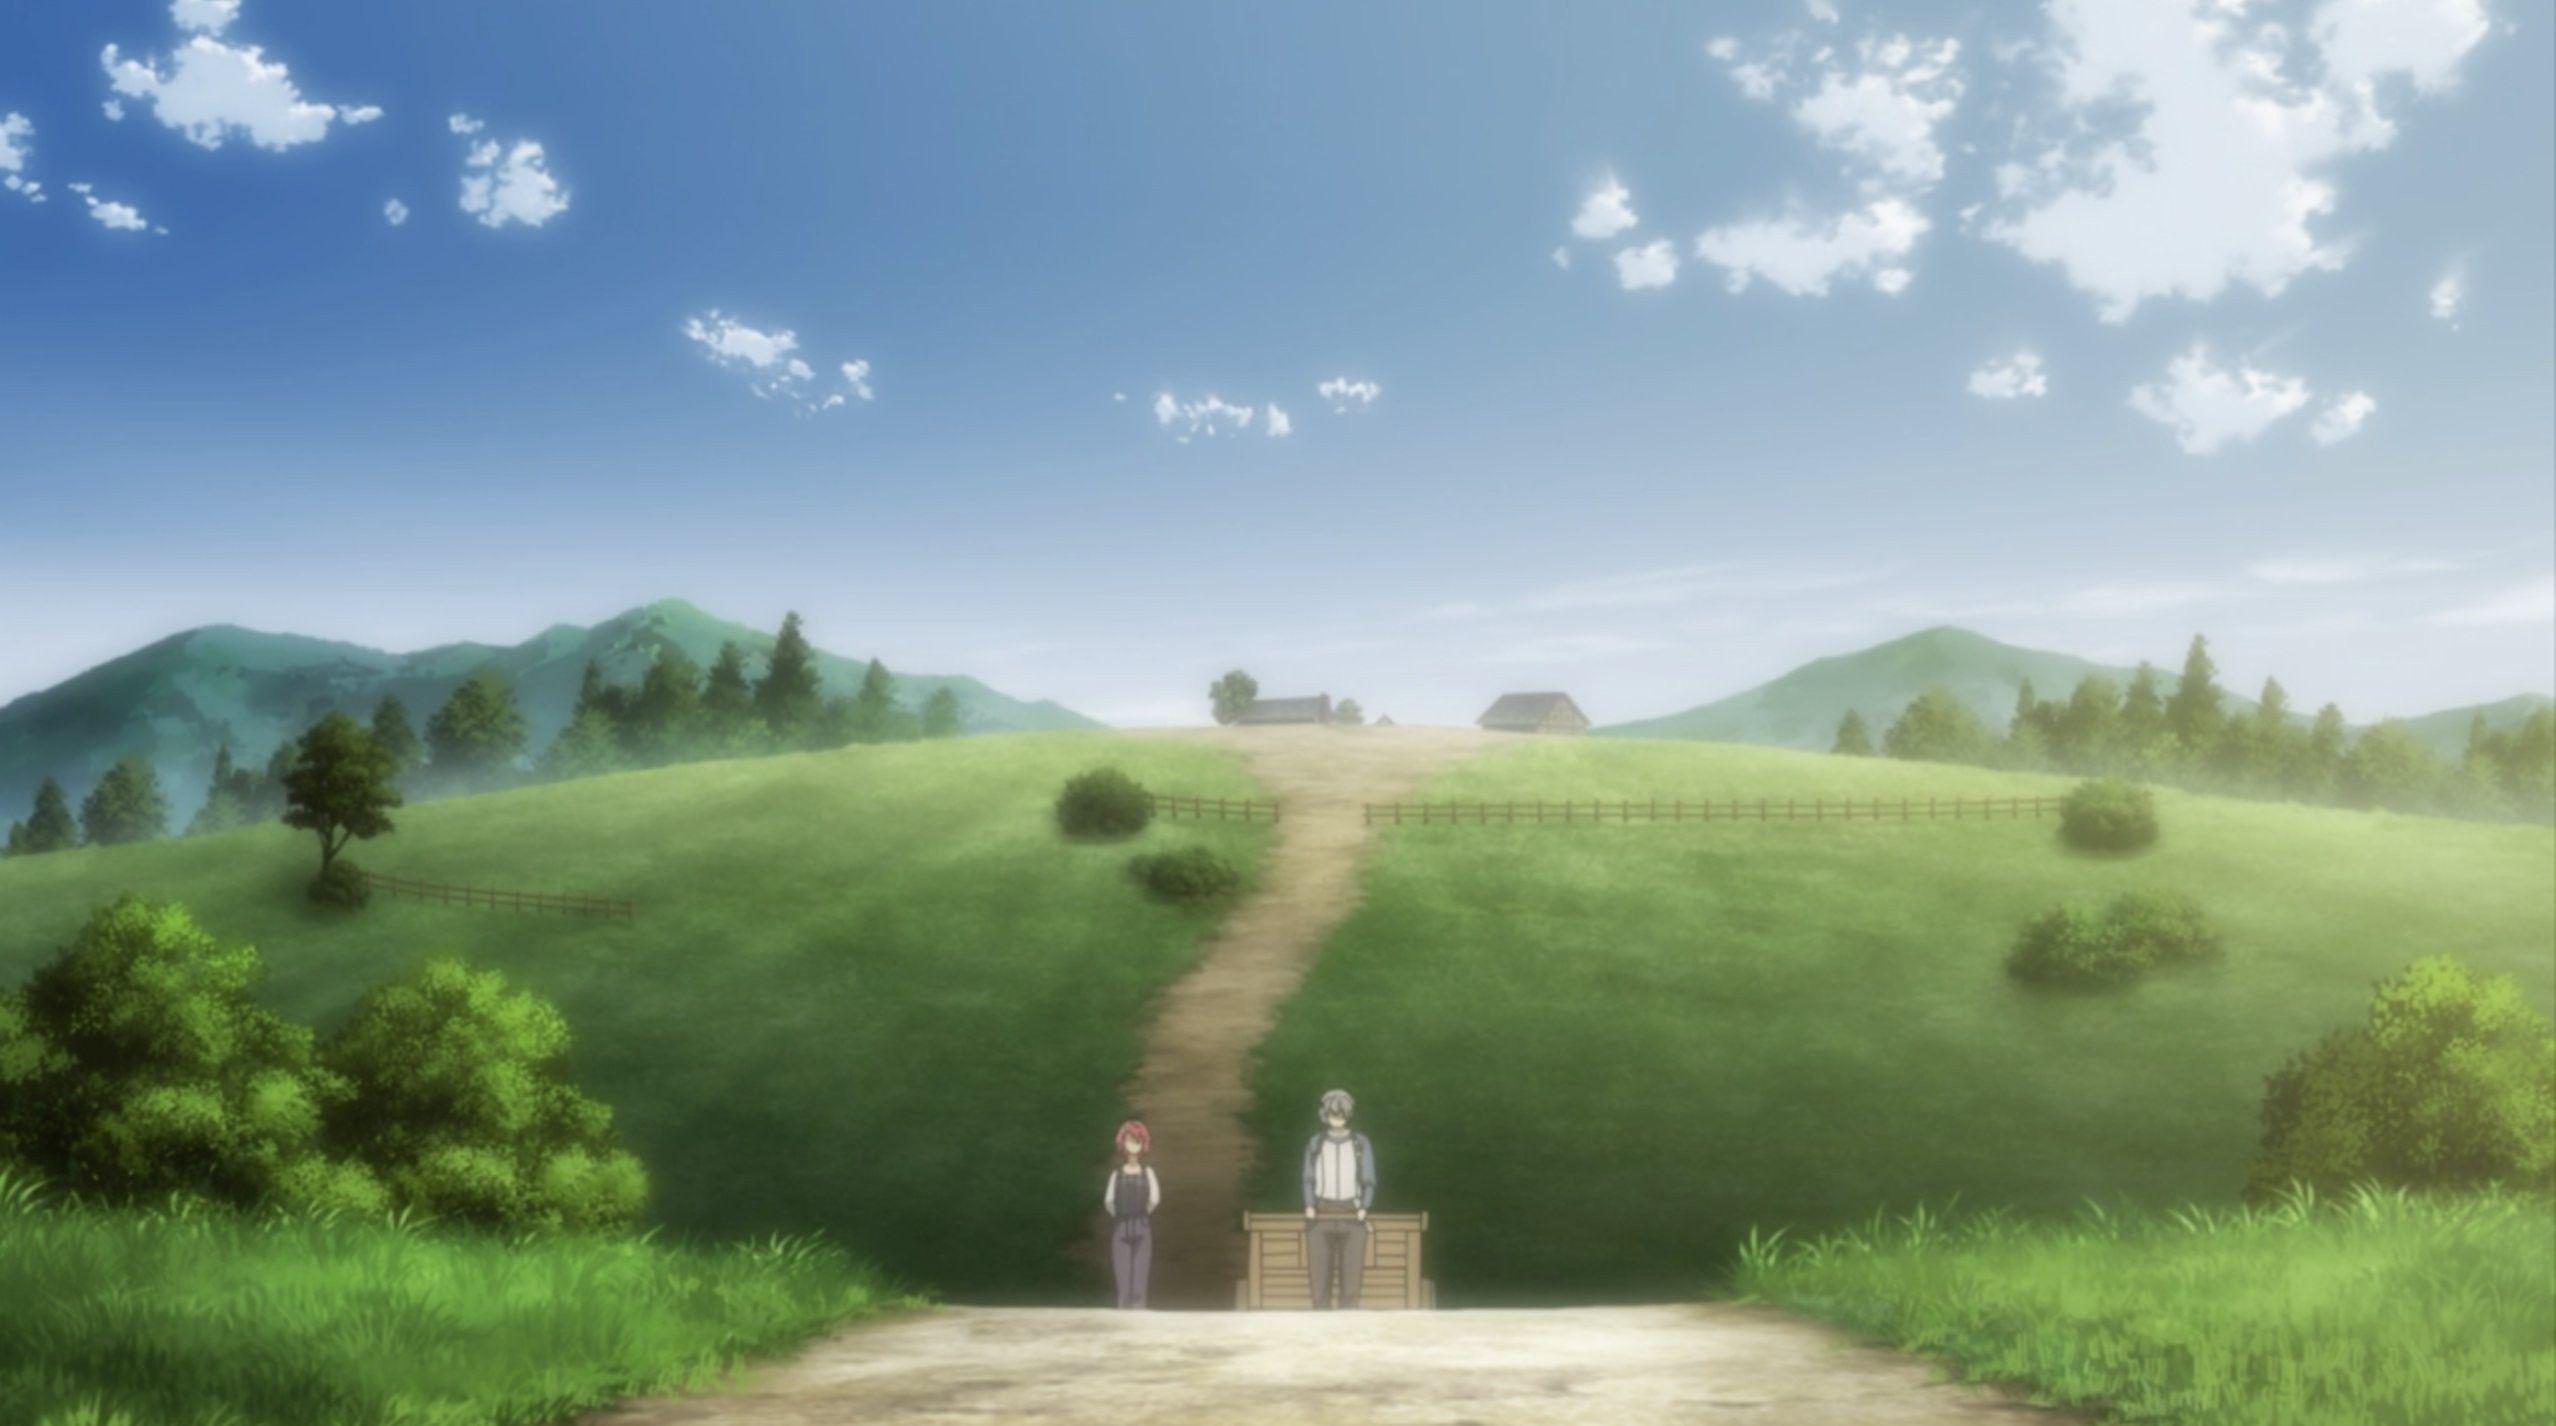 Episode 10 Dozing Crunchyroll Funimation anime Slayer